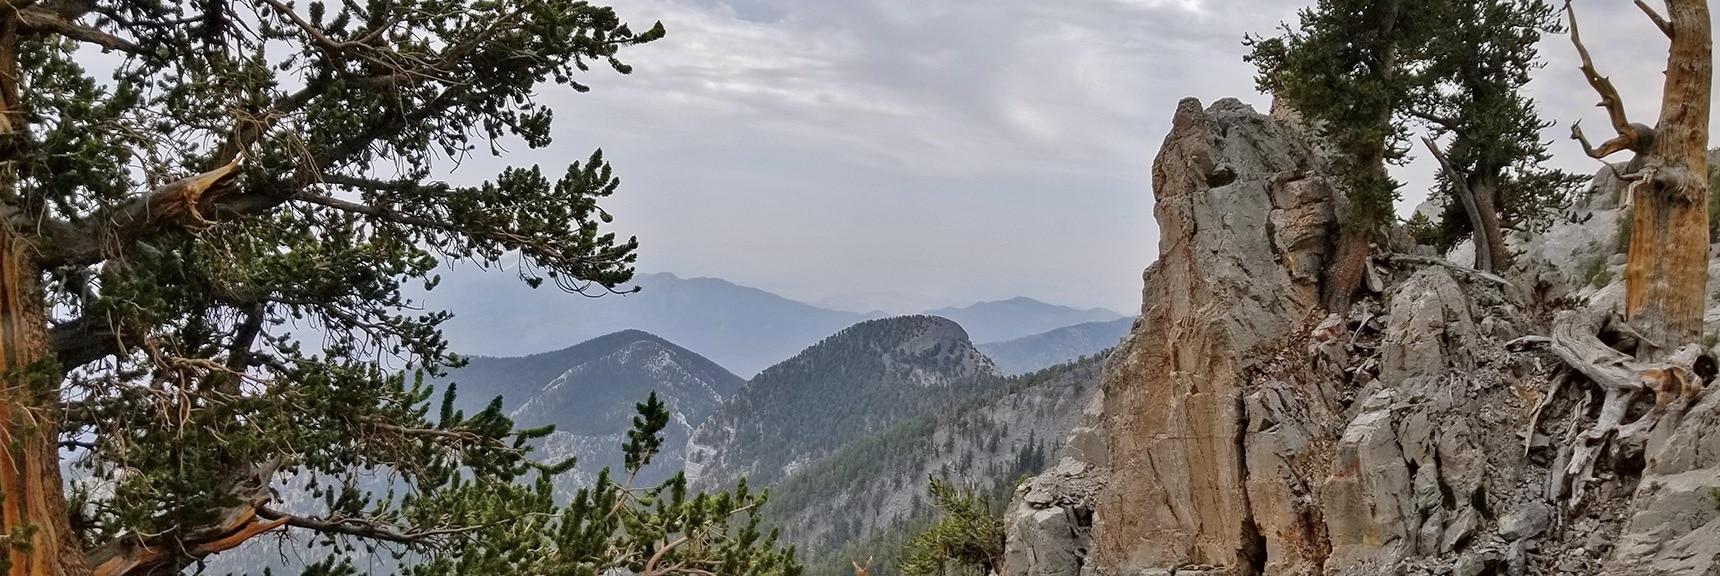 Fletcher Peak and Mummy's Toe from the NE Cliff Descent Chute | Mummy Mountain NE Cliffs Descent | Mt Charleston Wilderness | Spring Mountains, Nevada